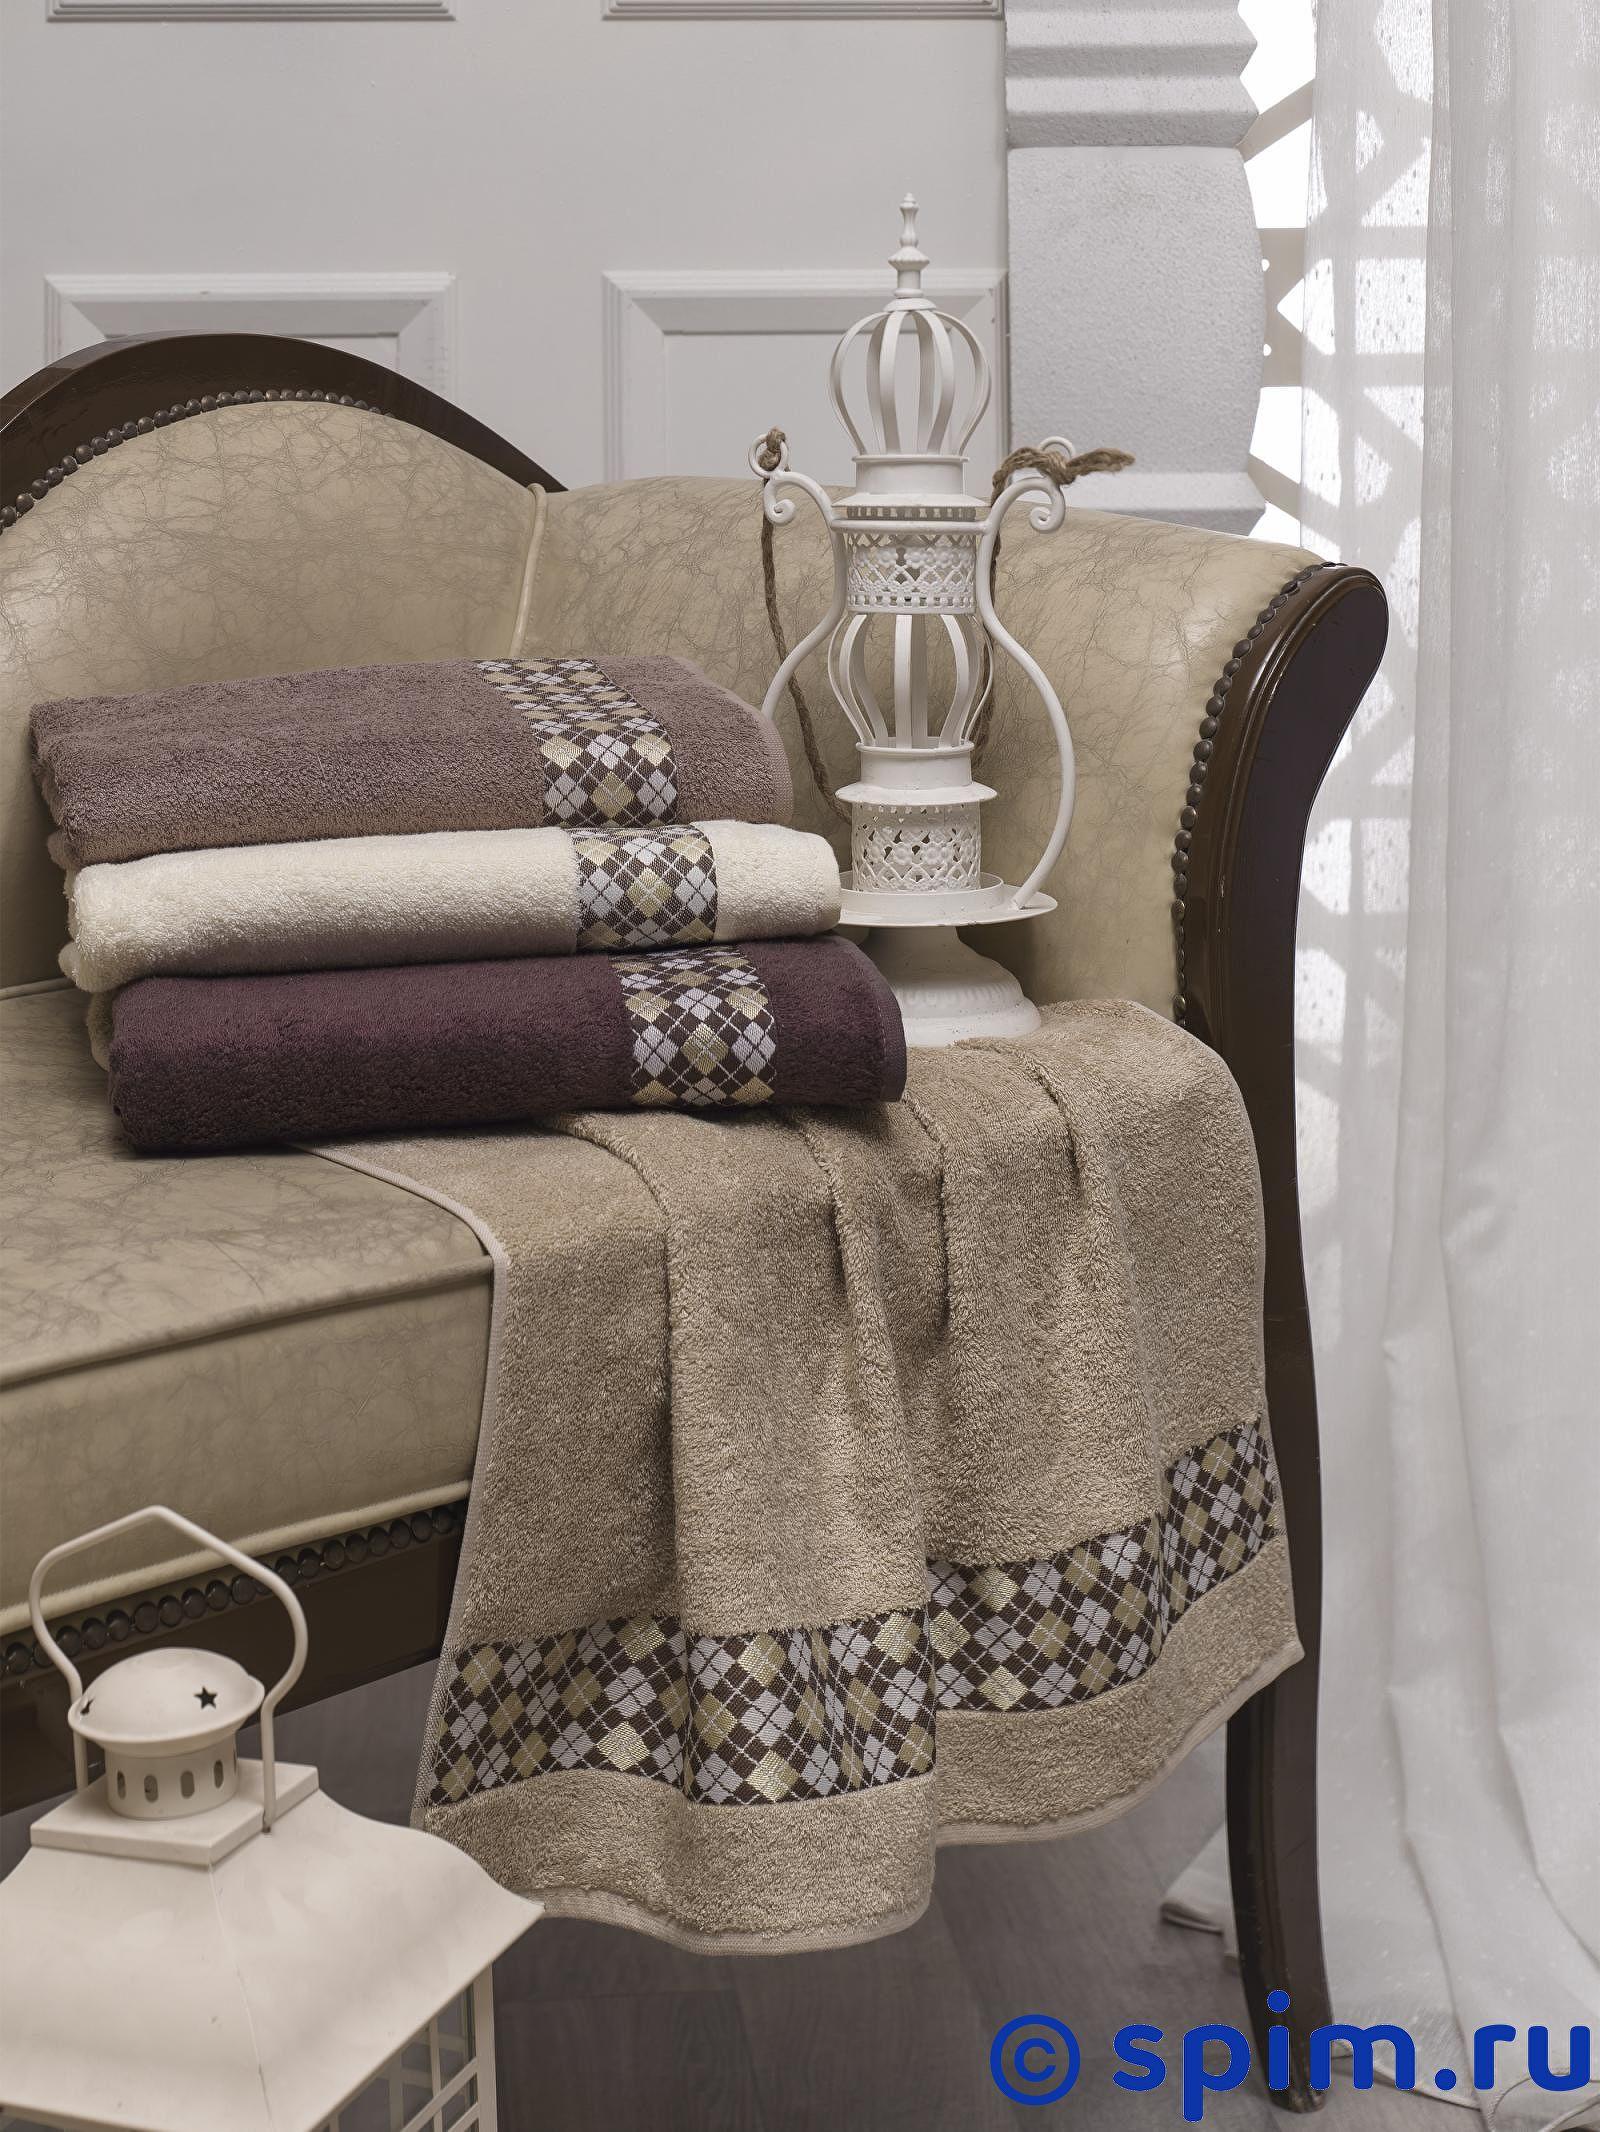 Набор из 4-х полотенец Do&co Ecose 50х90 см полотенца do n co полотенце lady цвет мятный набор